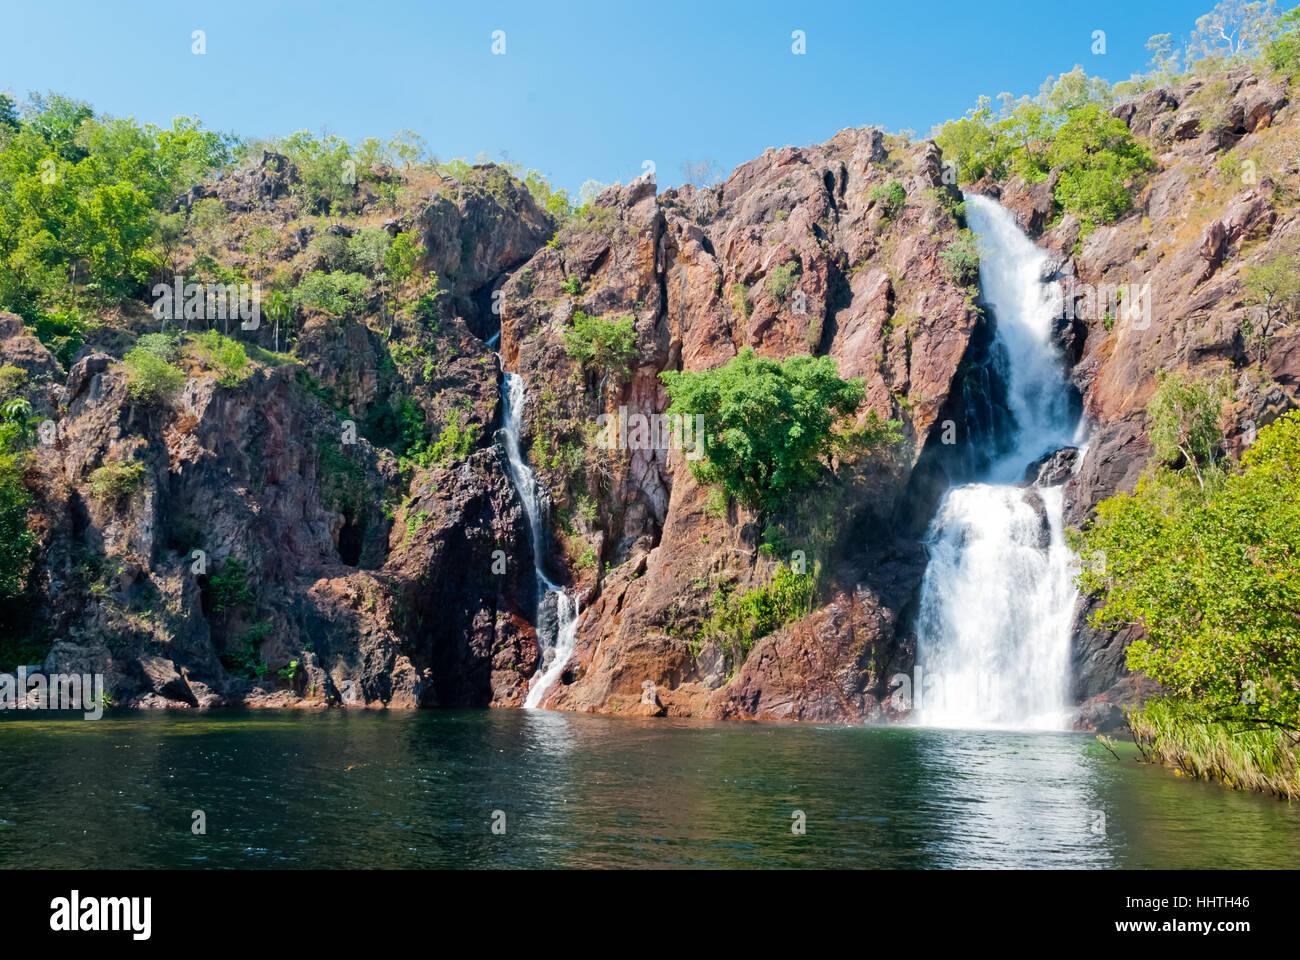 Wangi Falls, Litchfield National Park, Australia - Stock Image